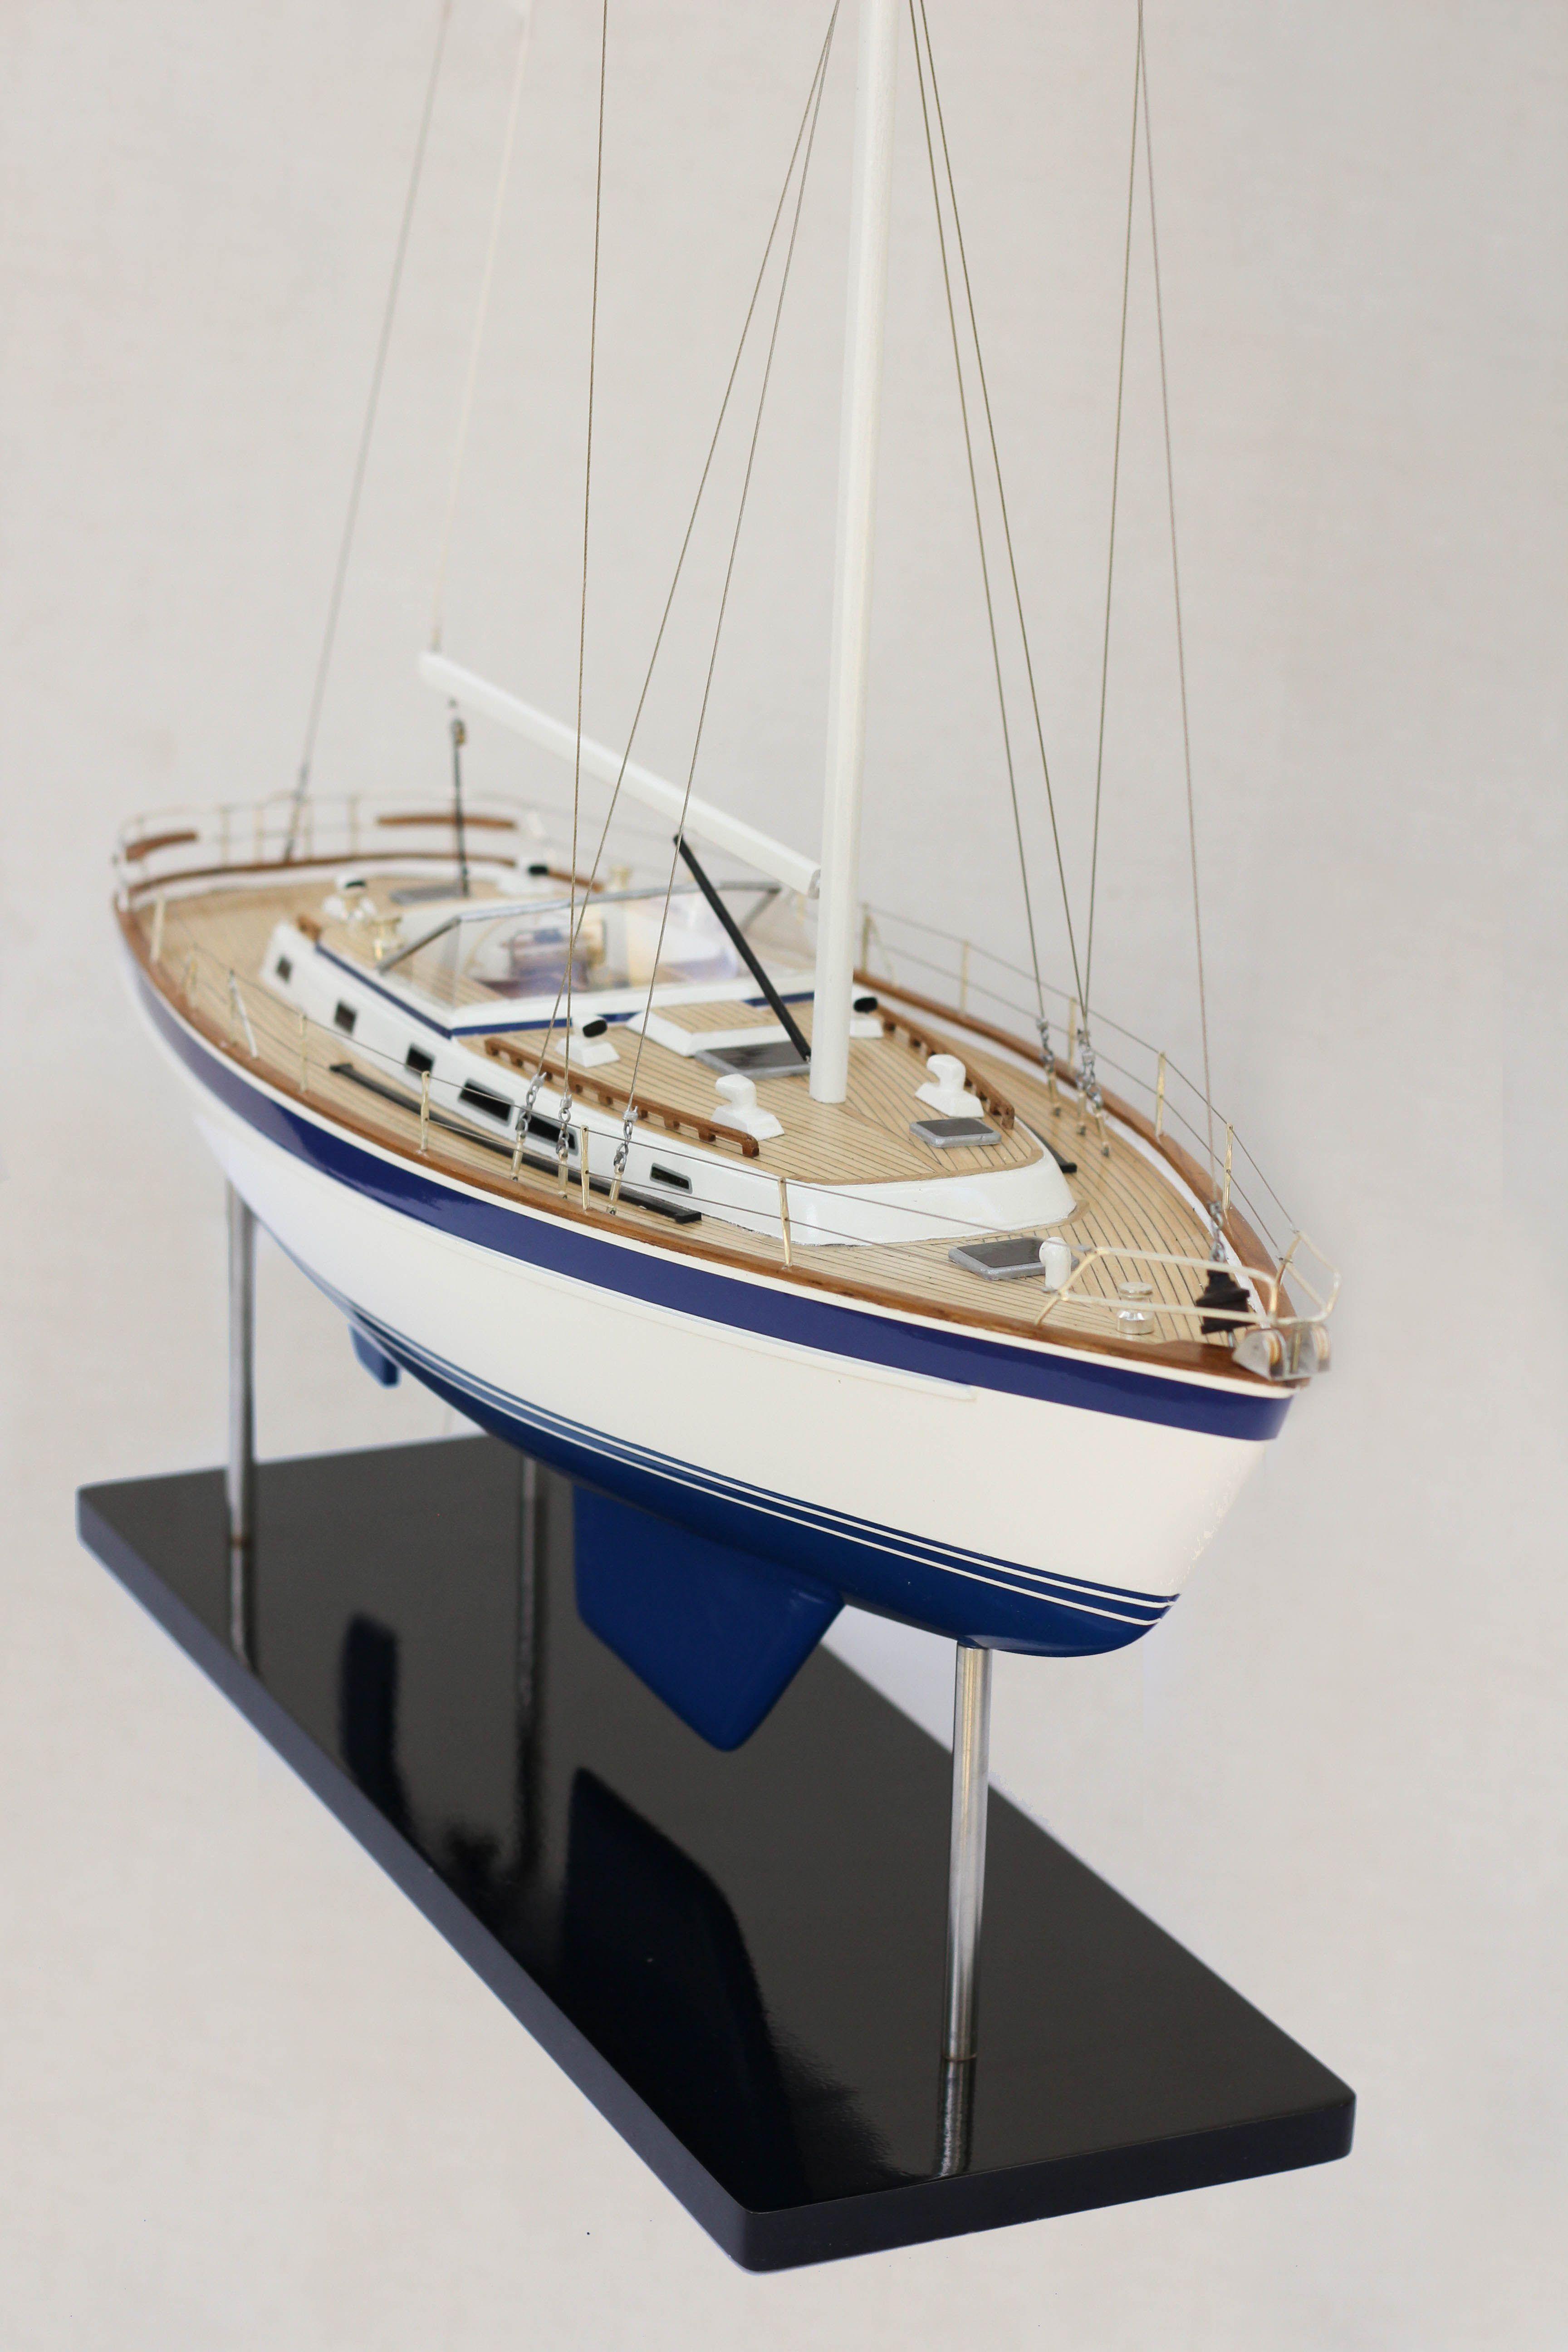 Halberg Rassy 42 Model Sailing Boat (Superior Range) - HM